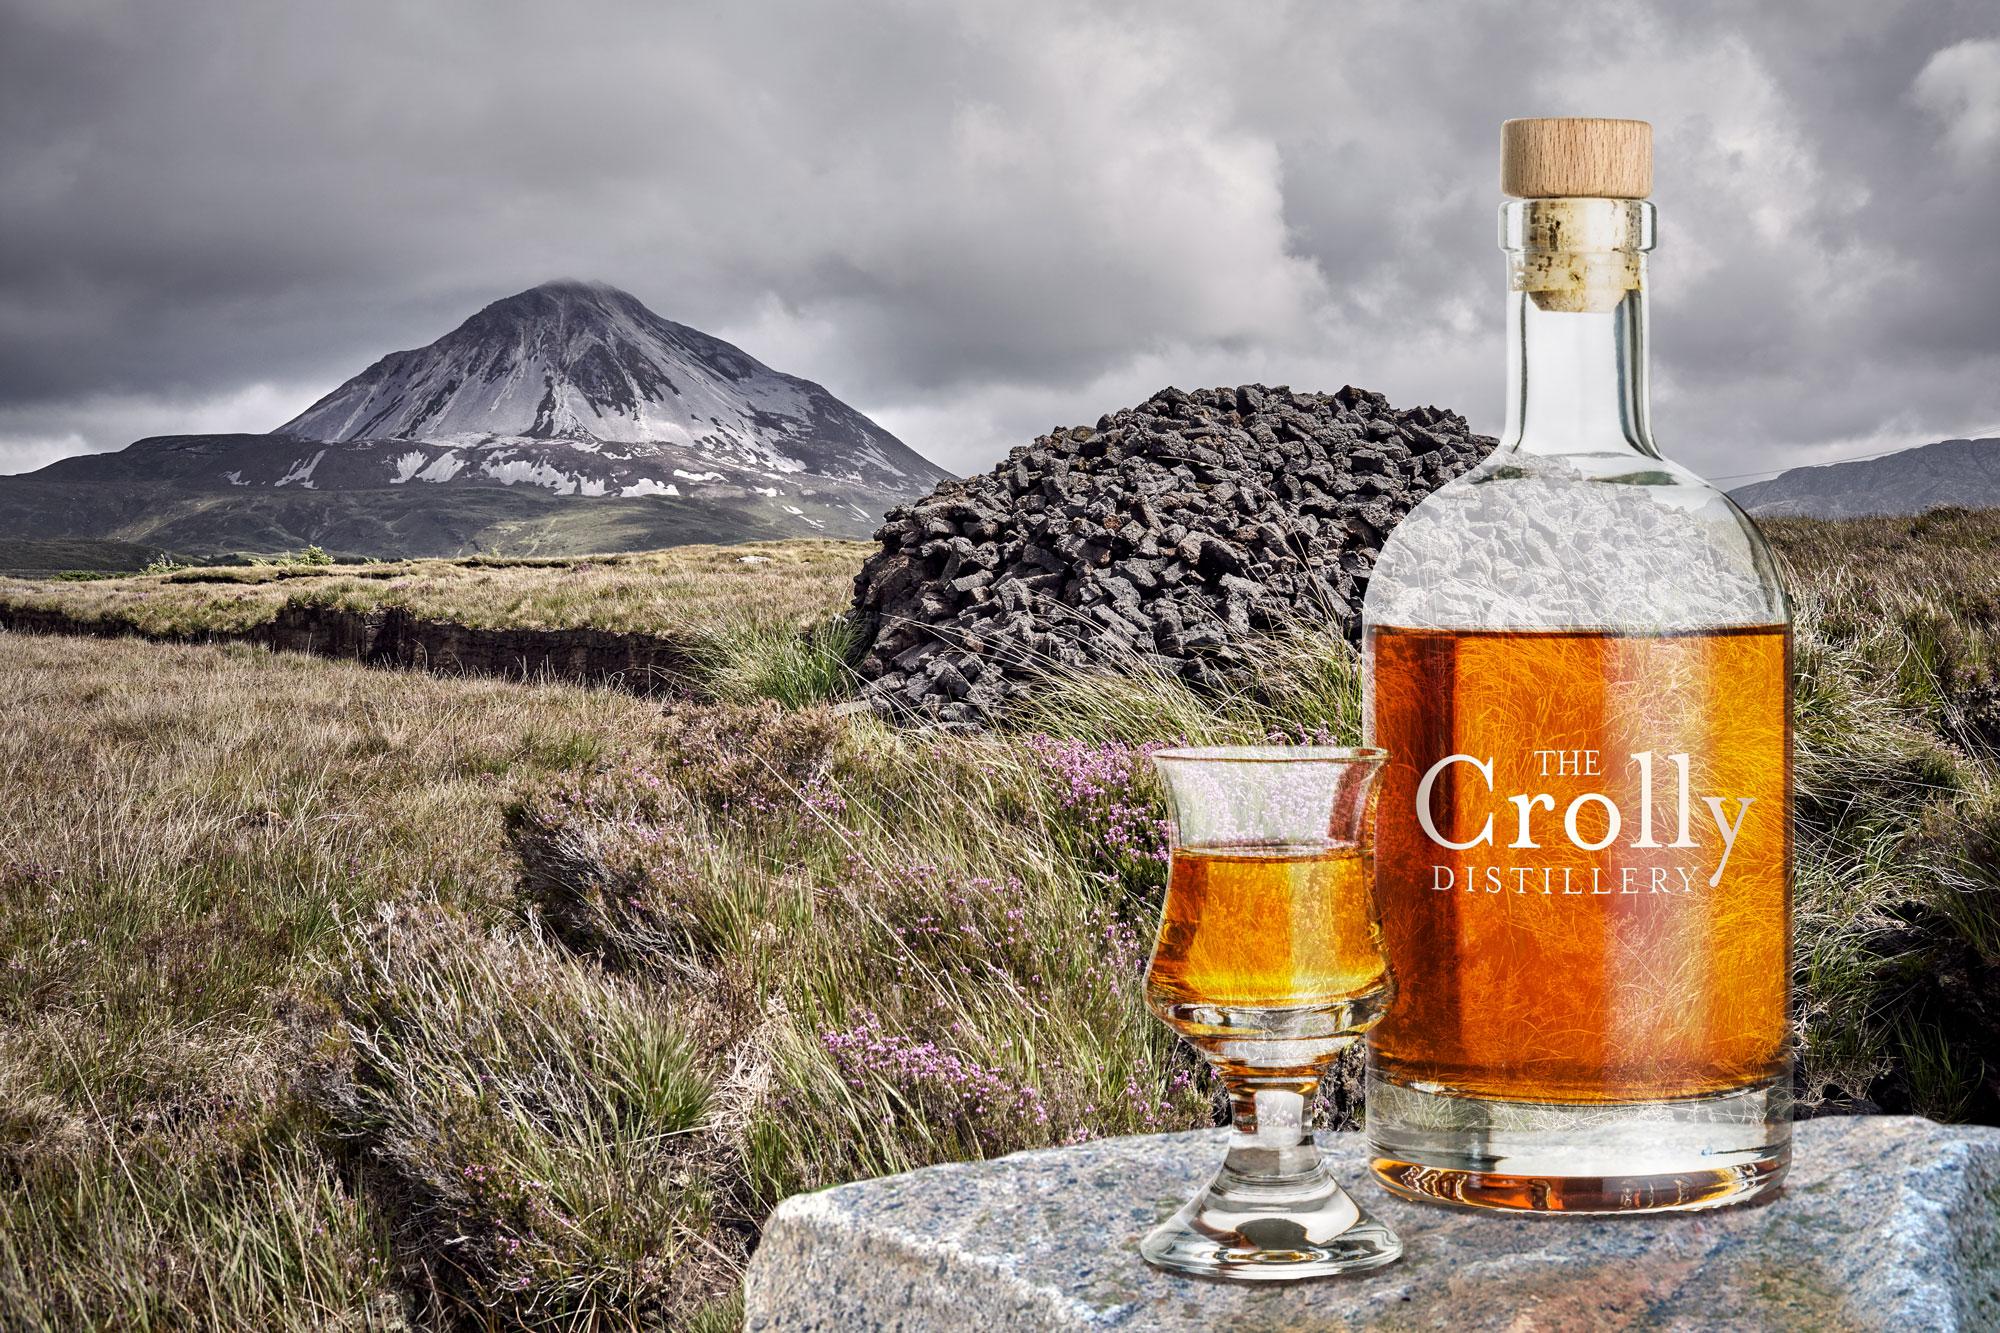 Crolly-Whiskey-Outside-Errigal